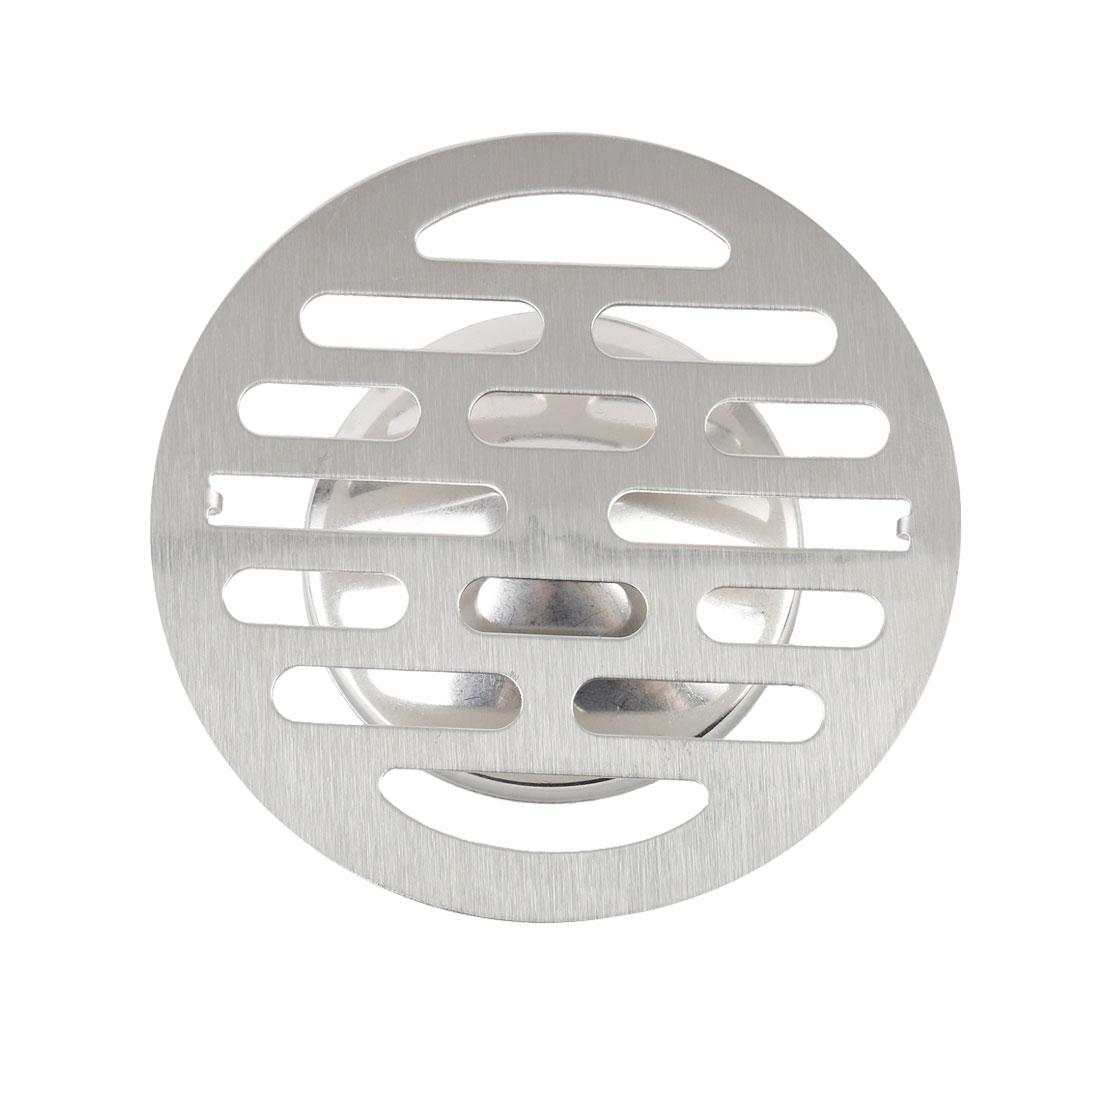 "4.3"" Floor Drain Cover Hair Catcher Deodorant Sink Filter Bathroom Kitchen"